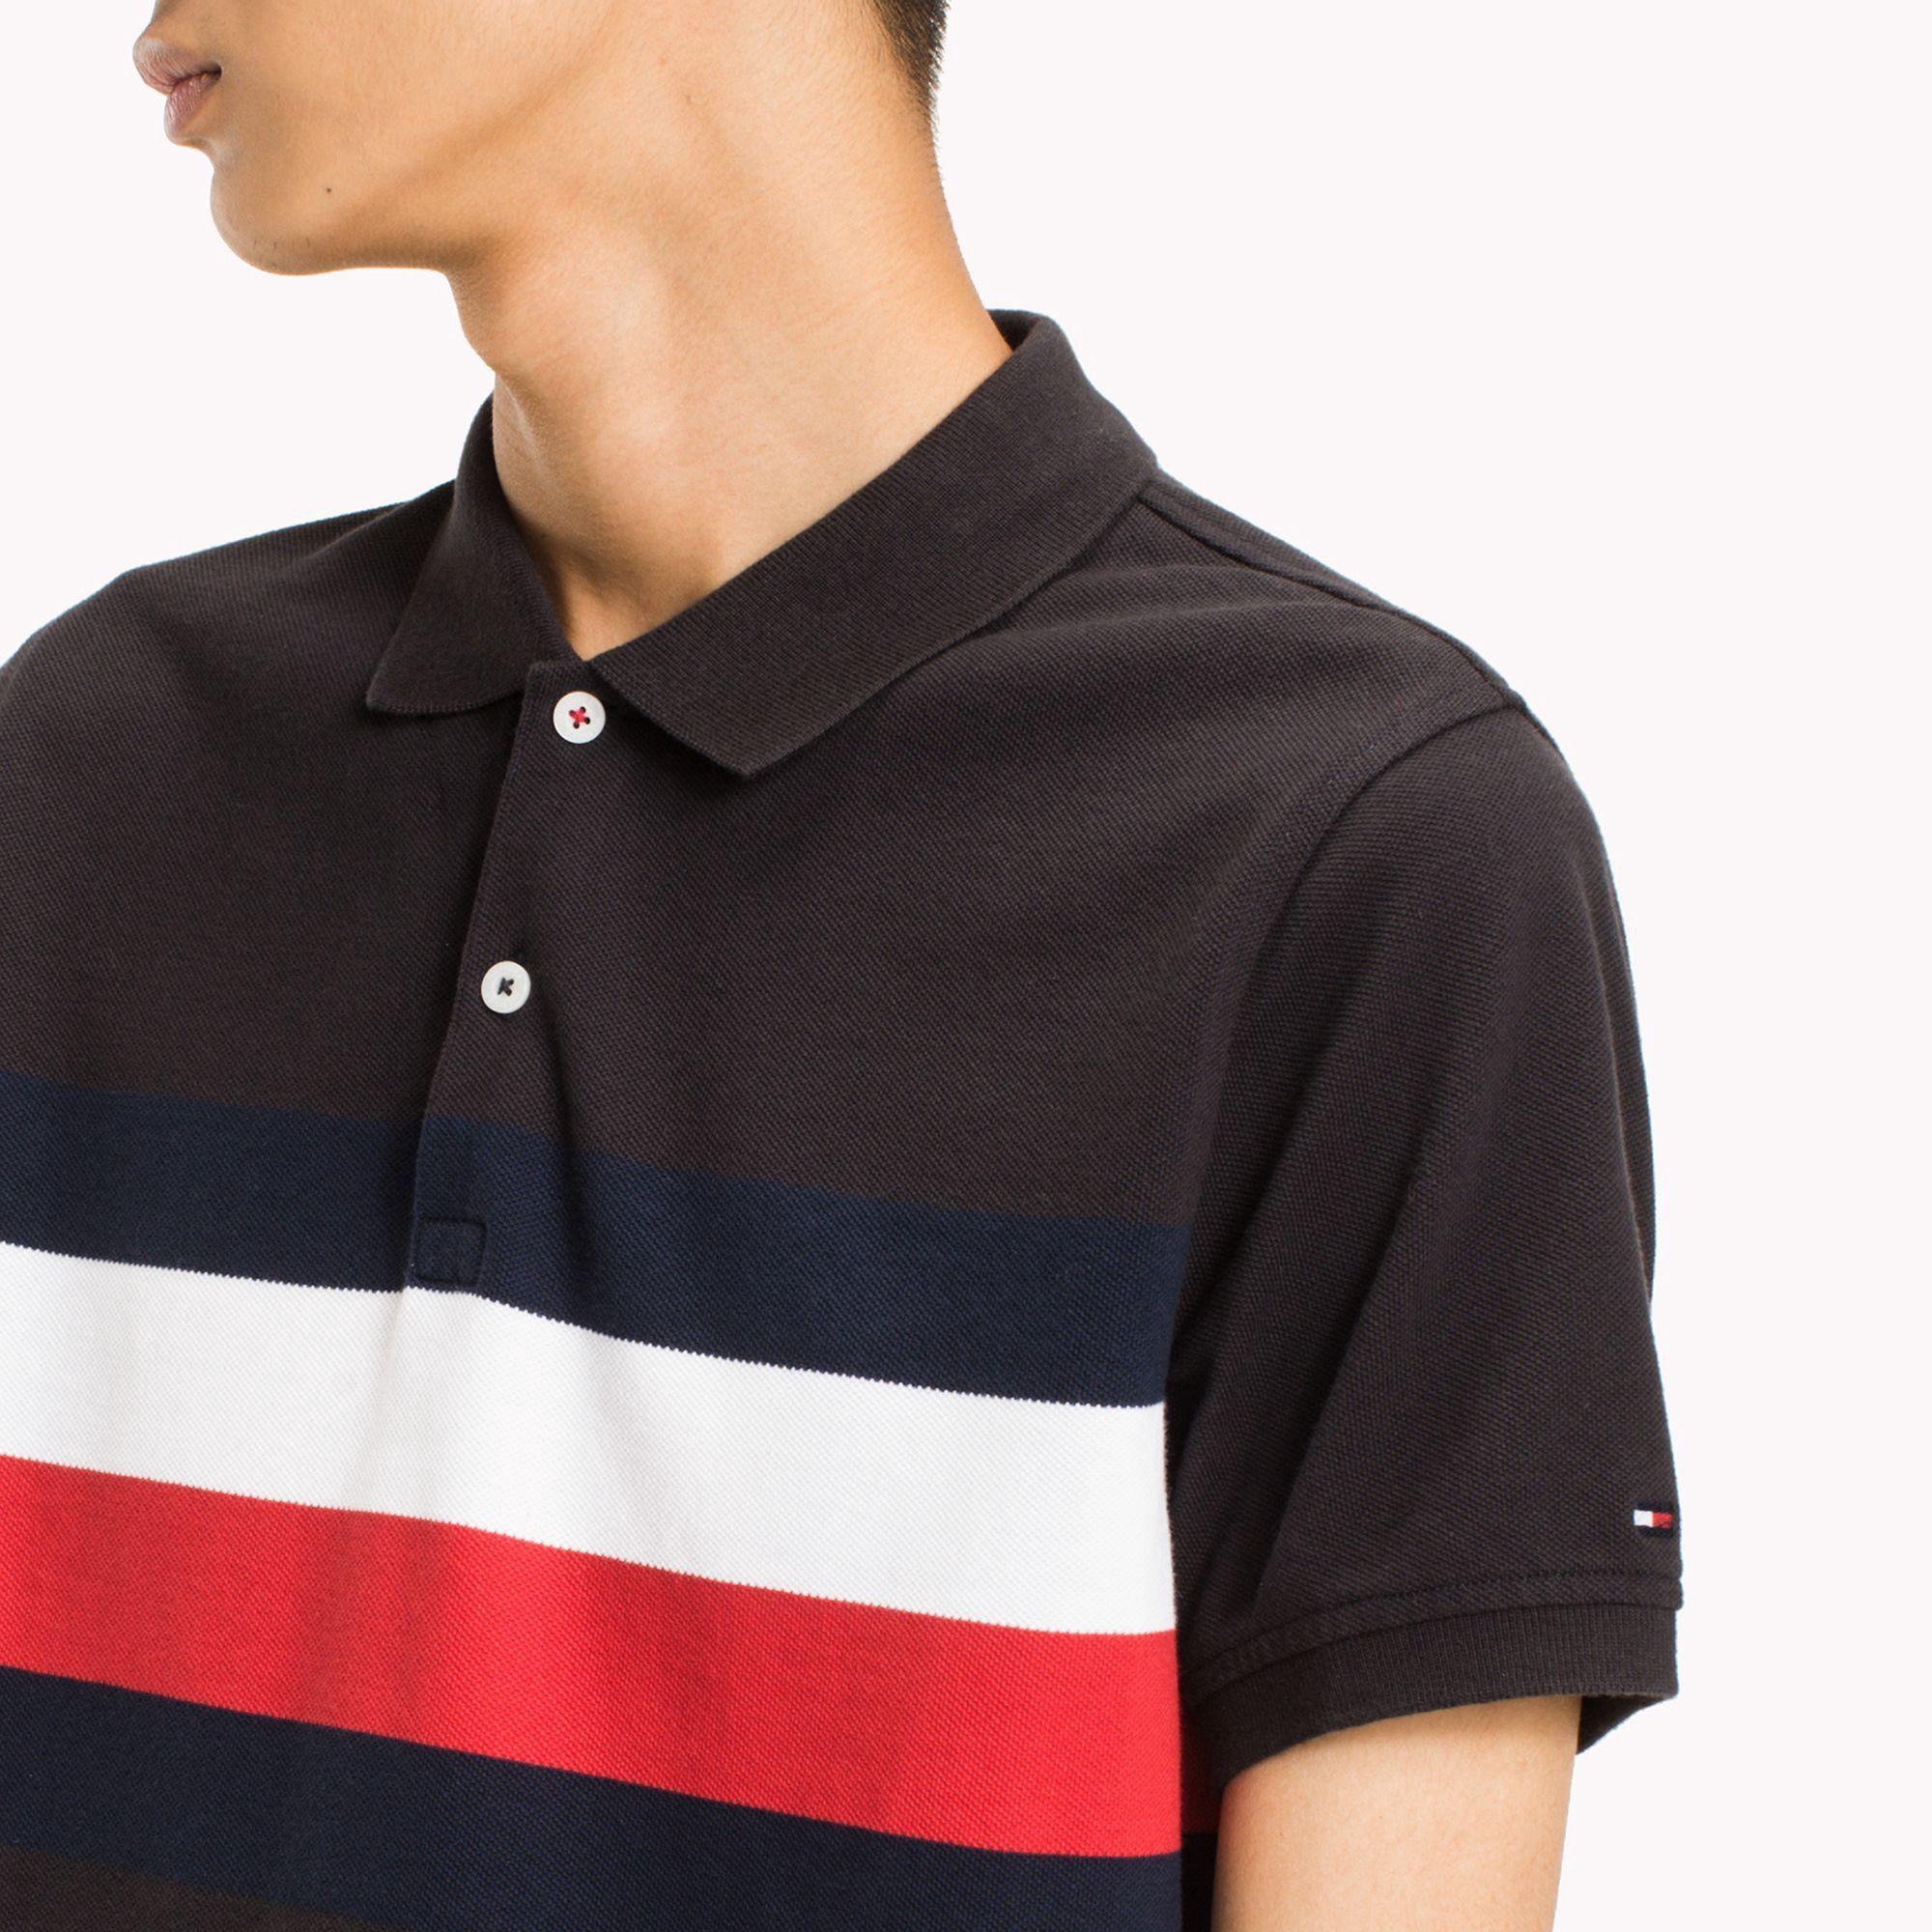 9586d621 Tommy Hilfiger Chest Stripe Slim Fit Polo - Cloud Heather / Multi Xxl